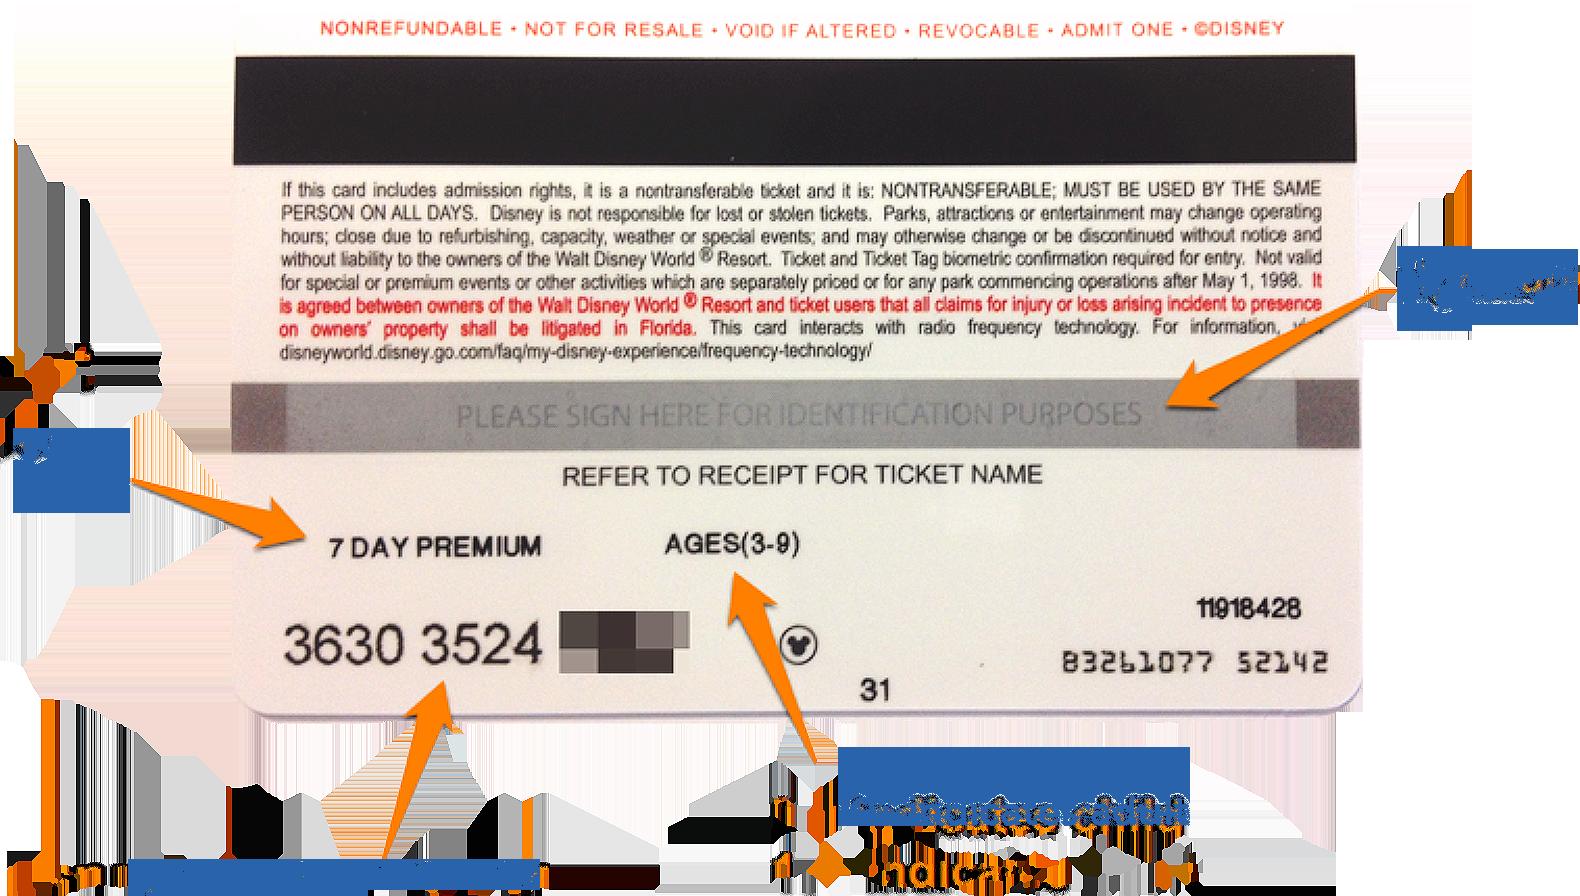 my ticket plus card